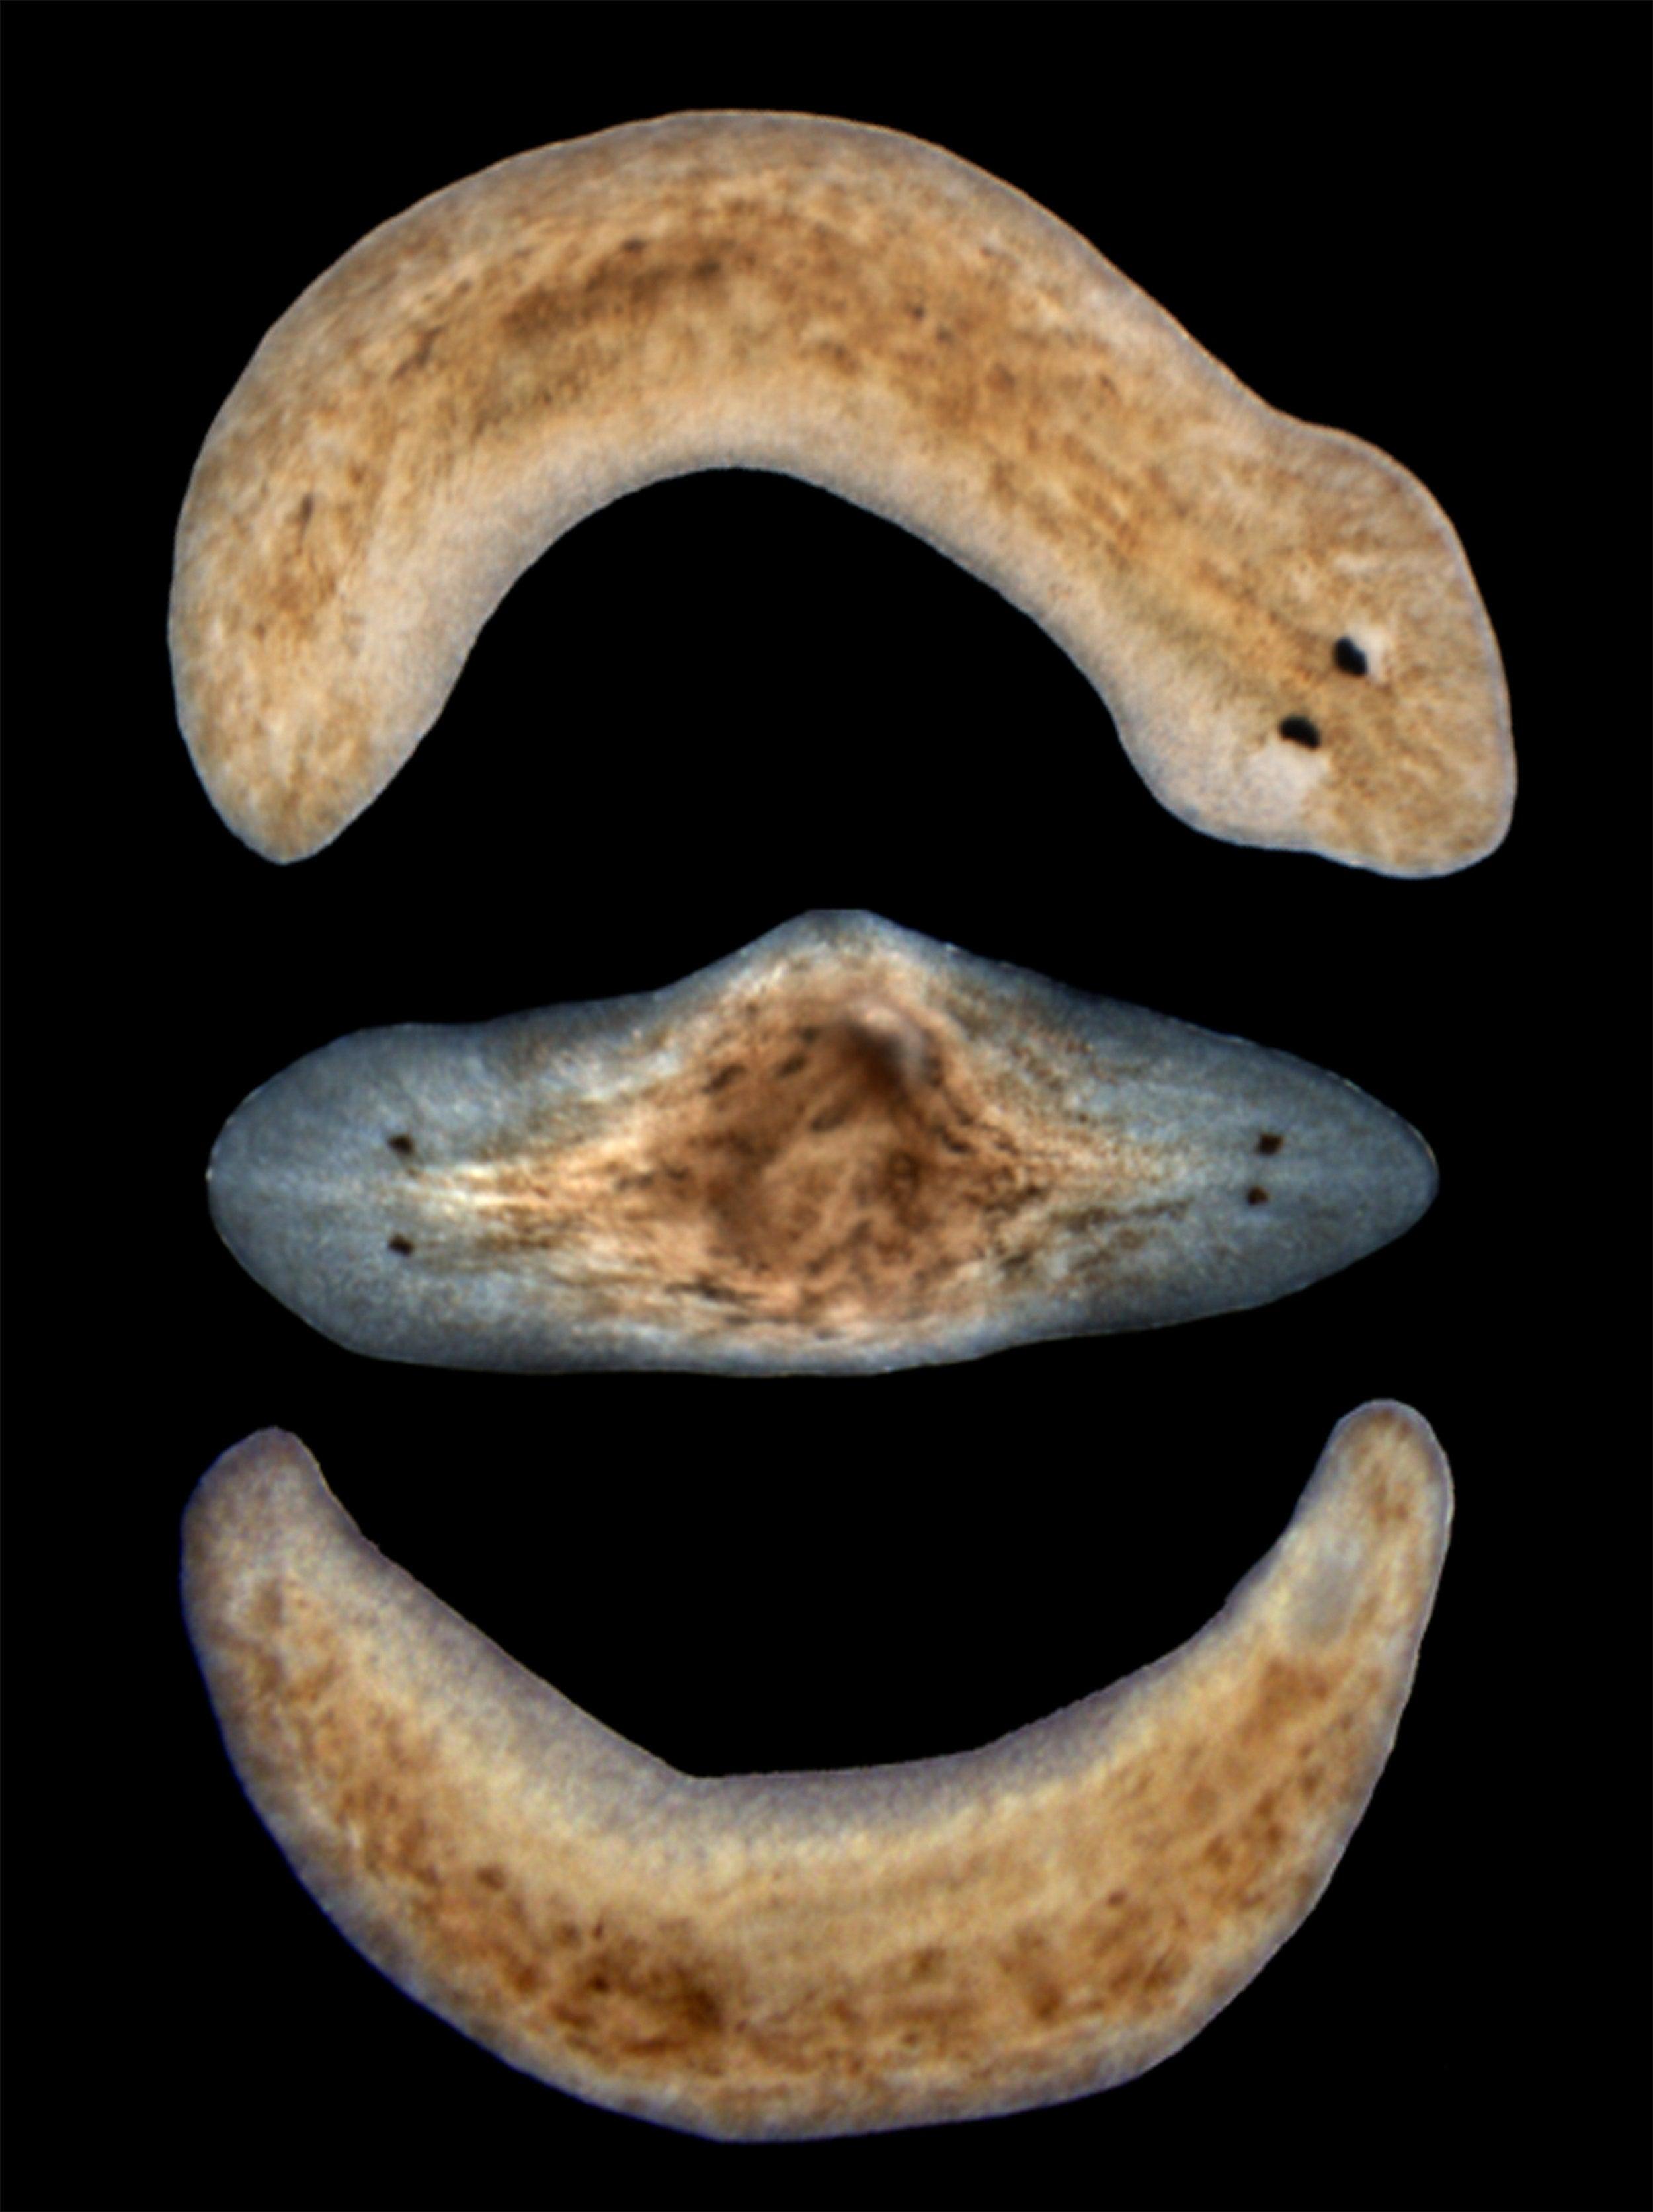 Planaria flatworms